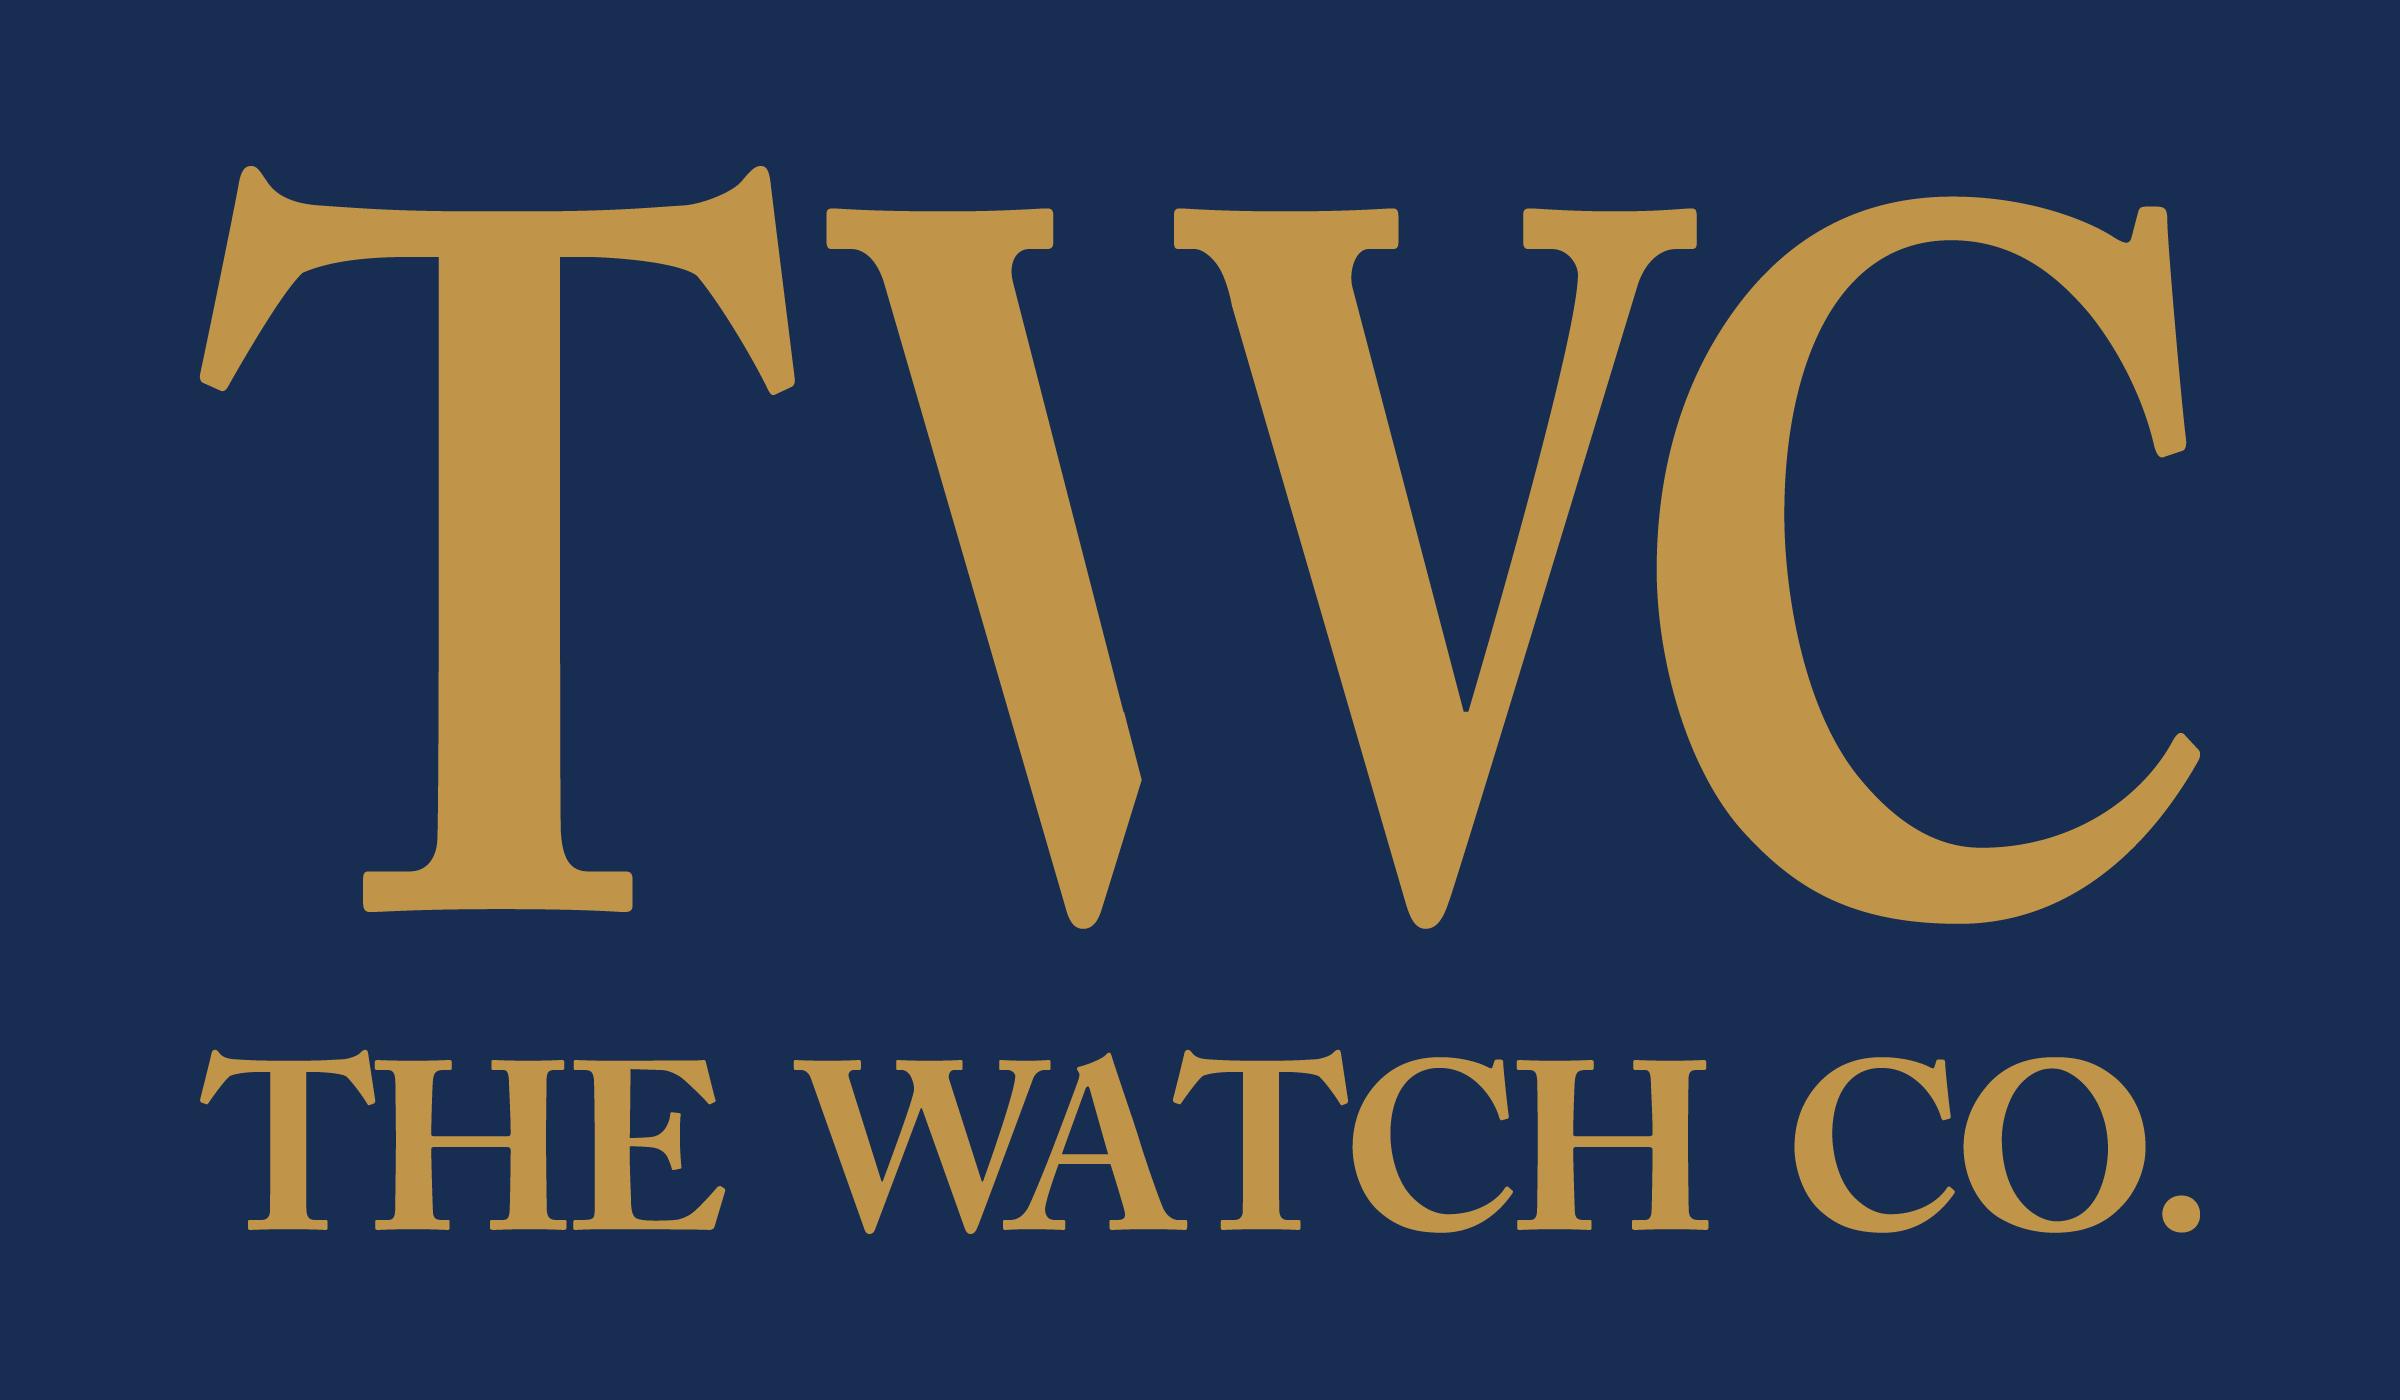 THE WATCH COMPANY